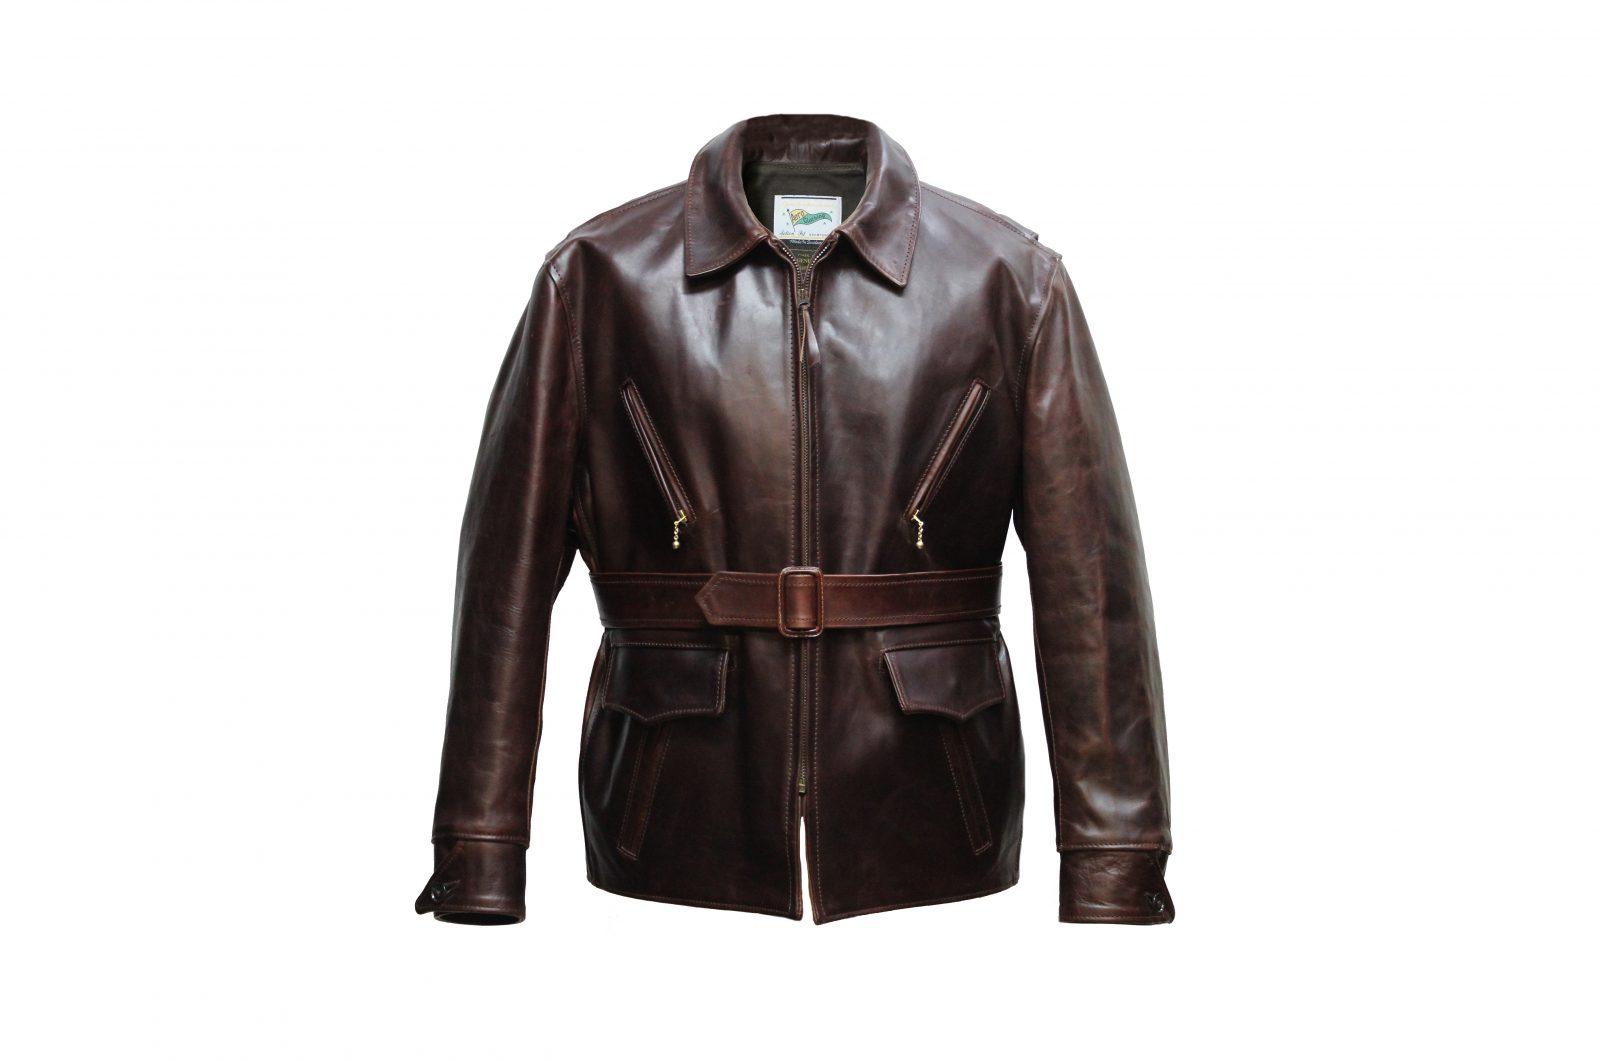 Aero Leather Northeaster Jacket 1600x1061 - Aero Leather Northeaster Jacket